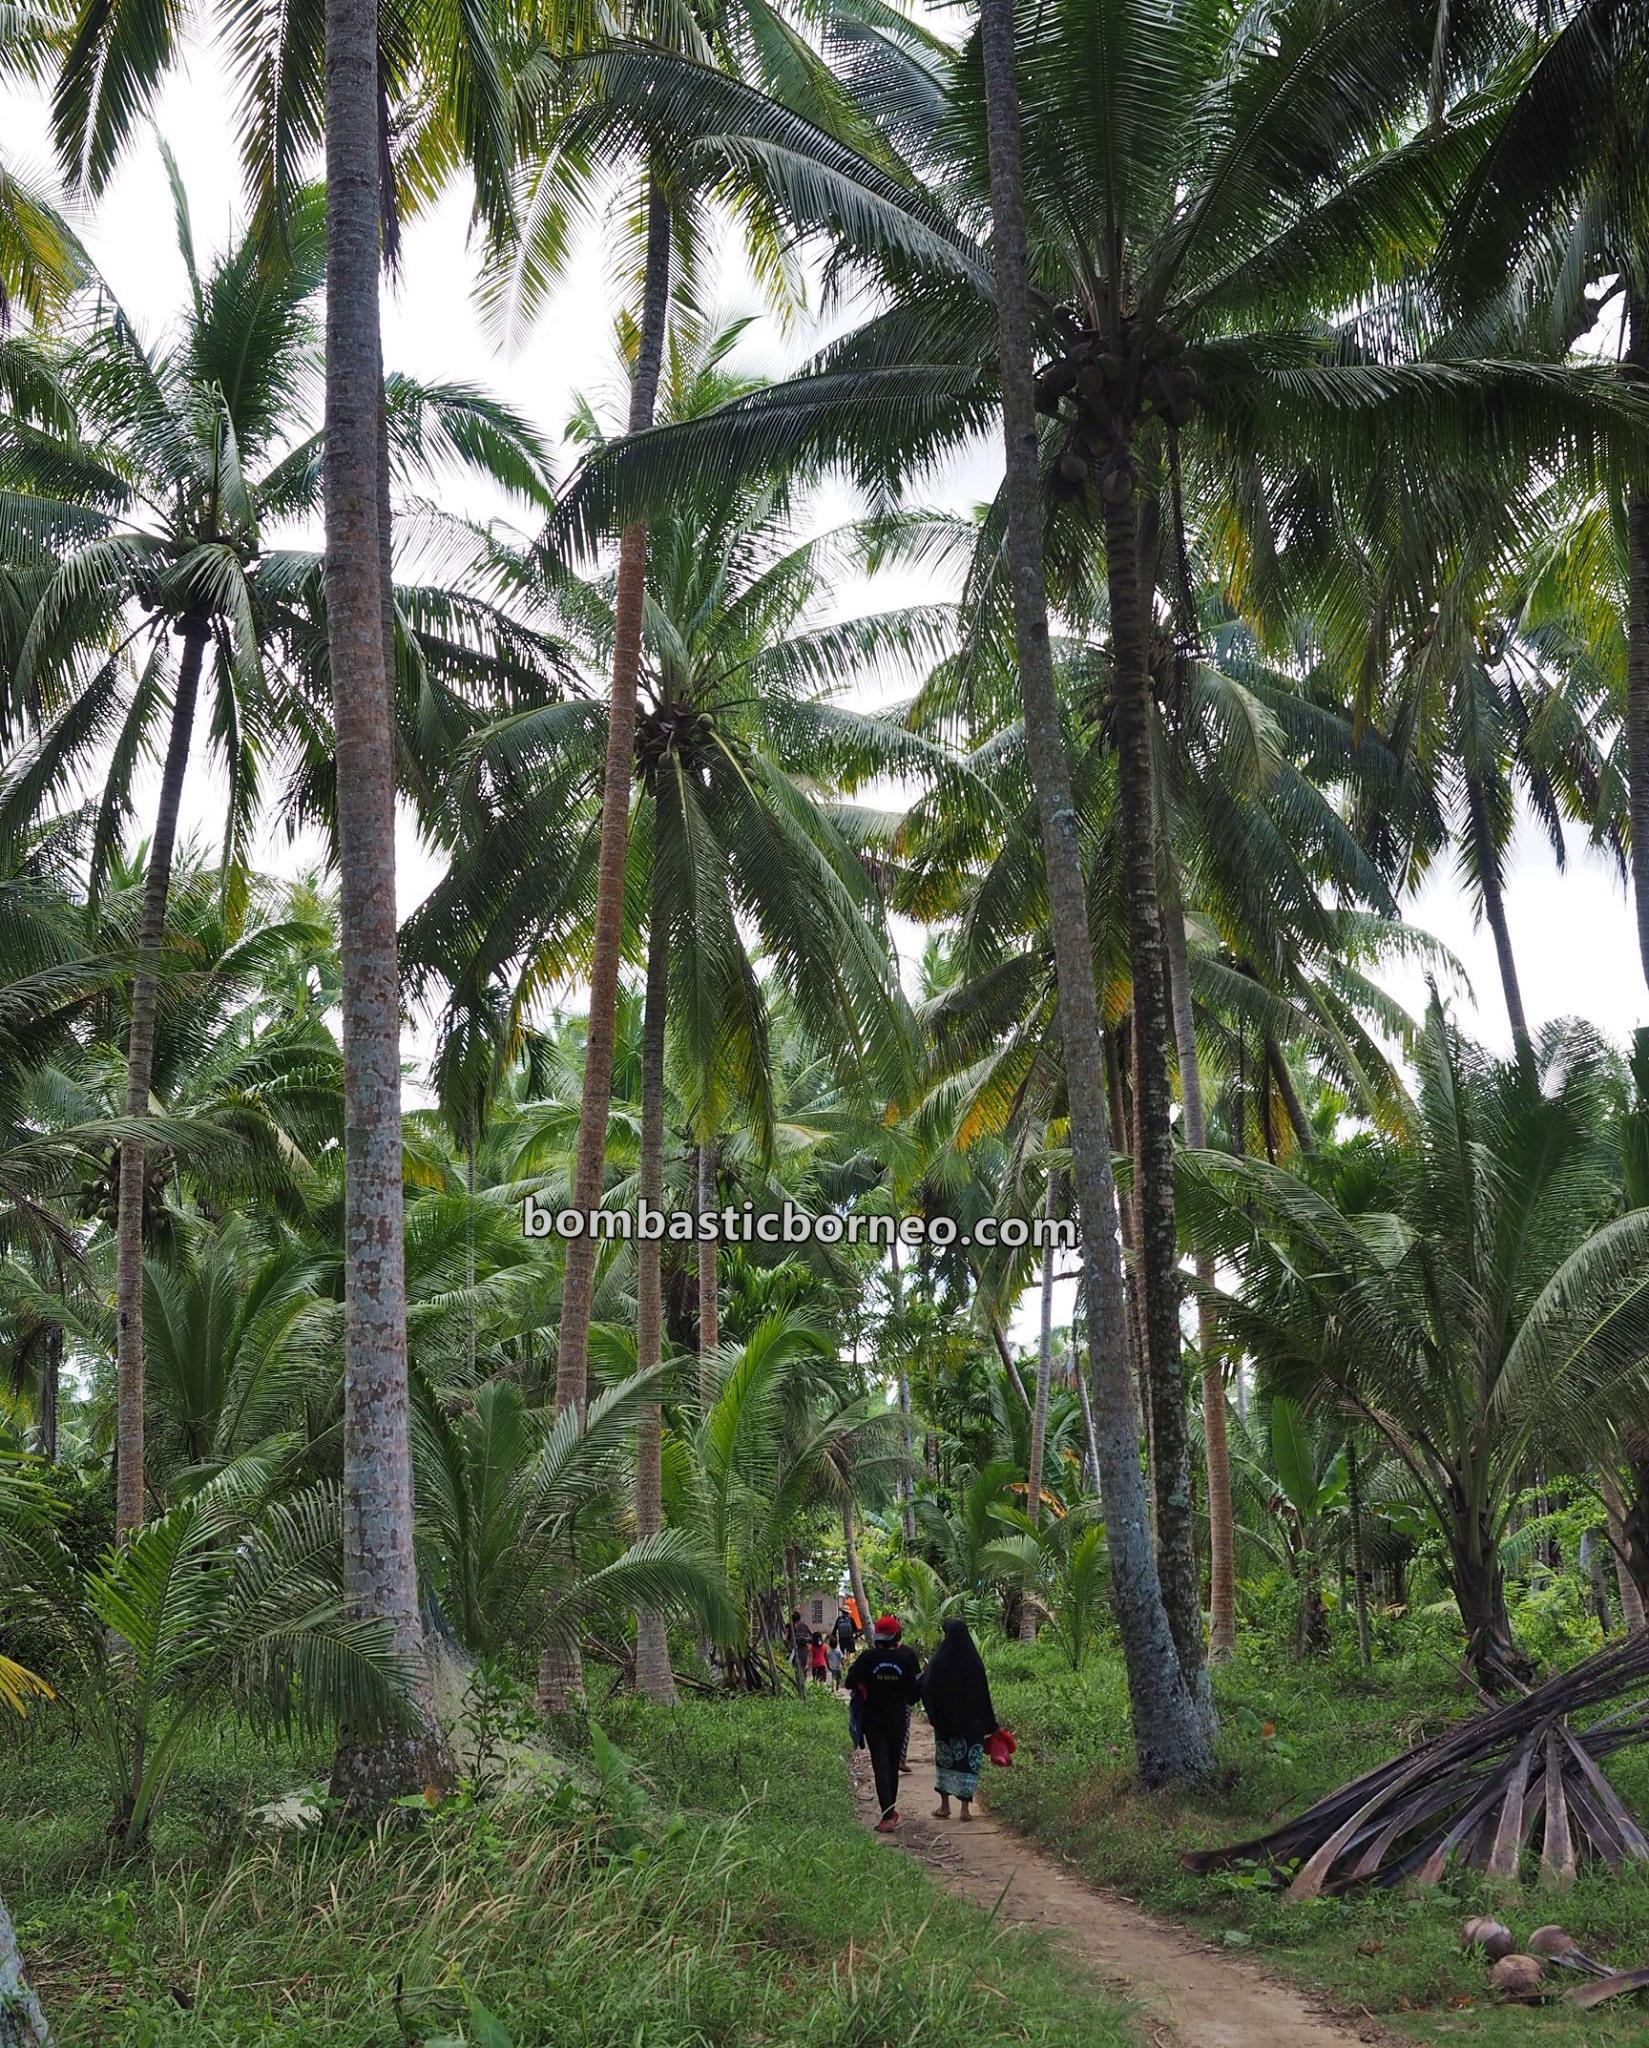 Pantai Putri Serayi, beach, adventure, traditional, nature, Malay fishing village, Indonesia, West Kalimantan, Tourism, tourist attraction, Borneo, Cross Border, 探索婆罗洲游踪, 印尼西加里曼丹, 三发马来渔村